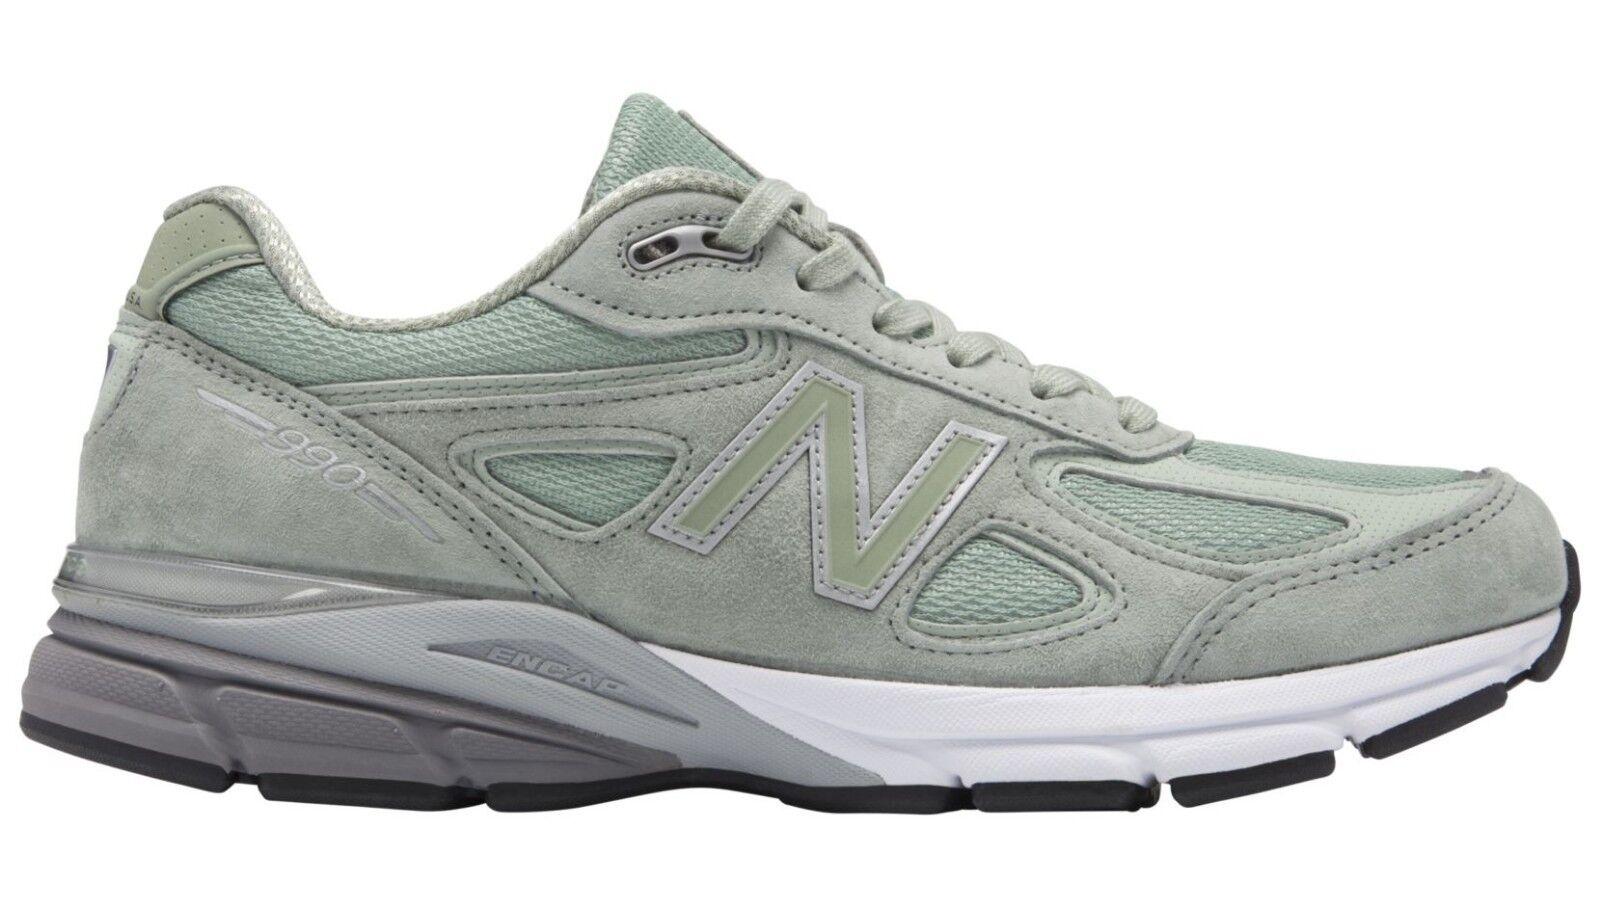 NIB NIB NIB New Balance MENS M990SM4 990 Silber MINT MADE IN USA RUNNING Turnschuhe 8-13 512e65